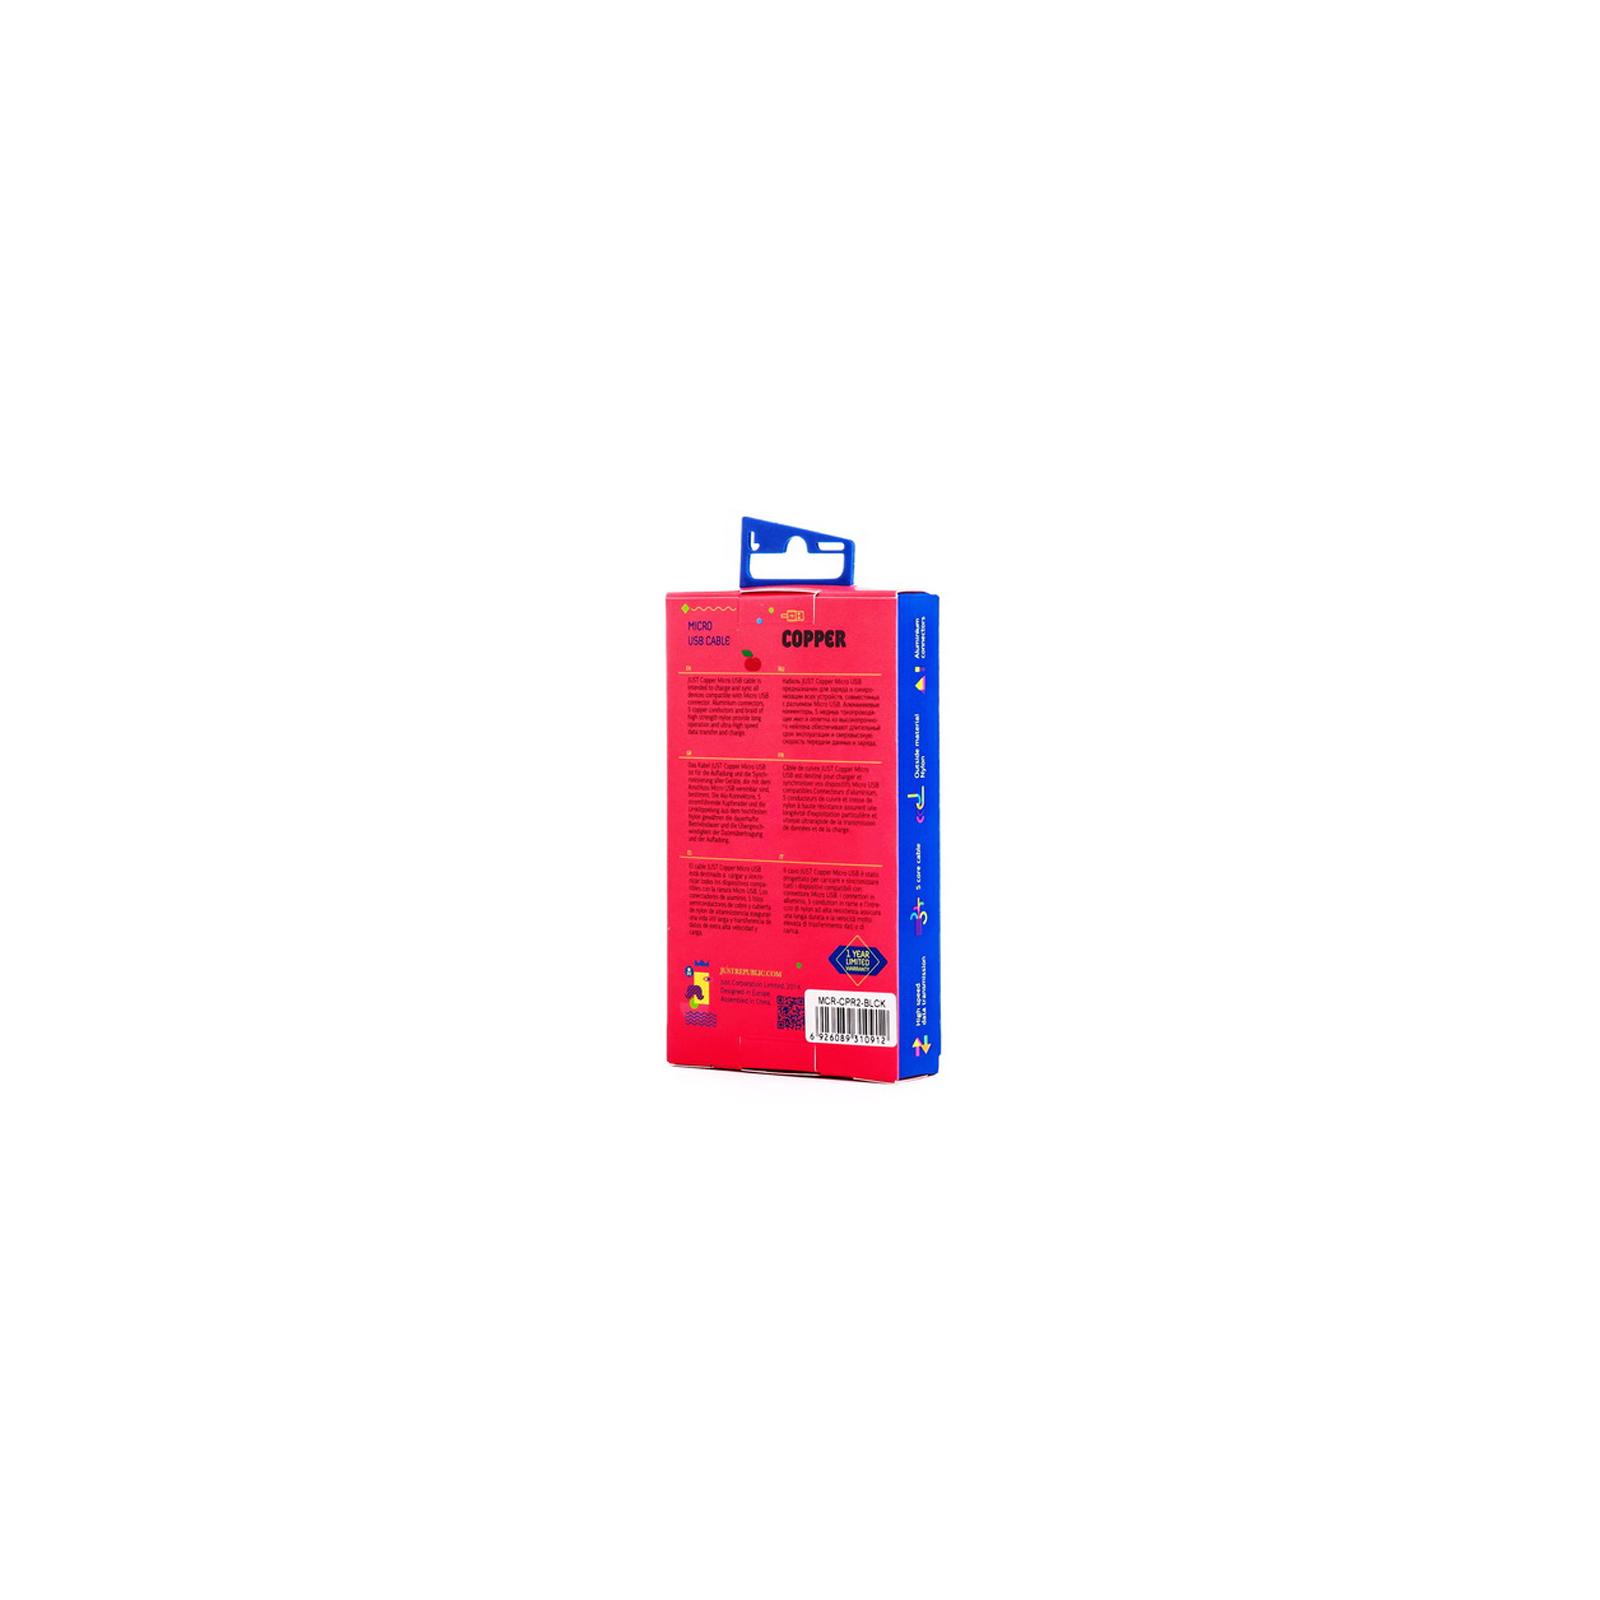 Дата кабель JUST Copper Micro USB Cable 0,5M Black (MCR-CPR05-BLCK) изображение 5